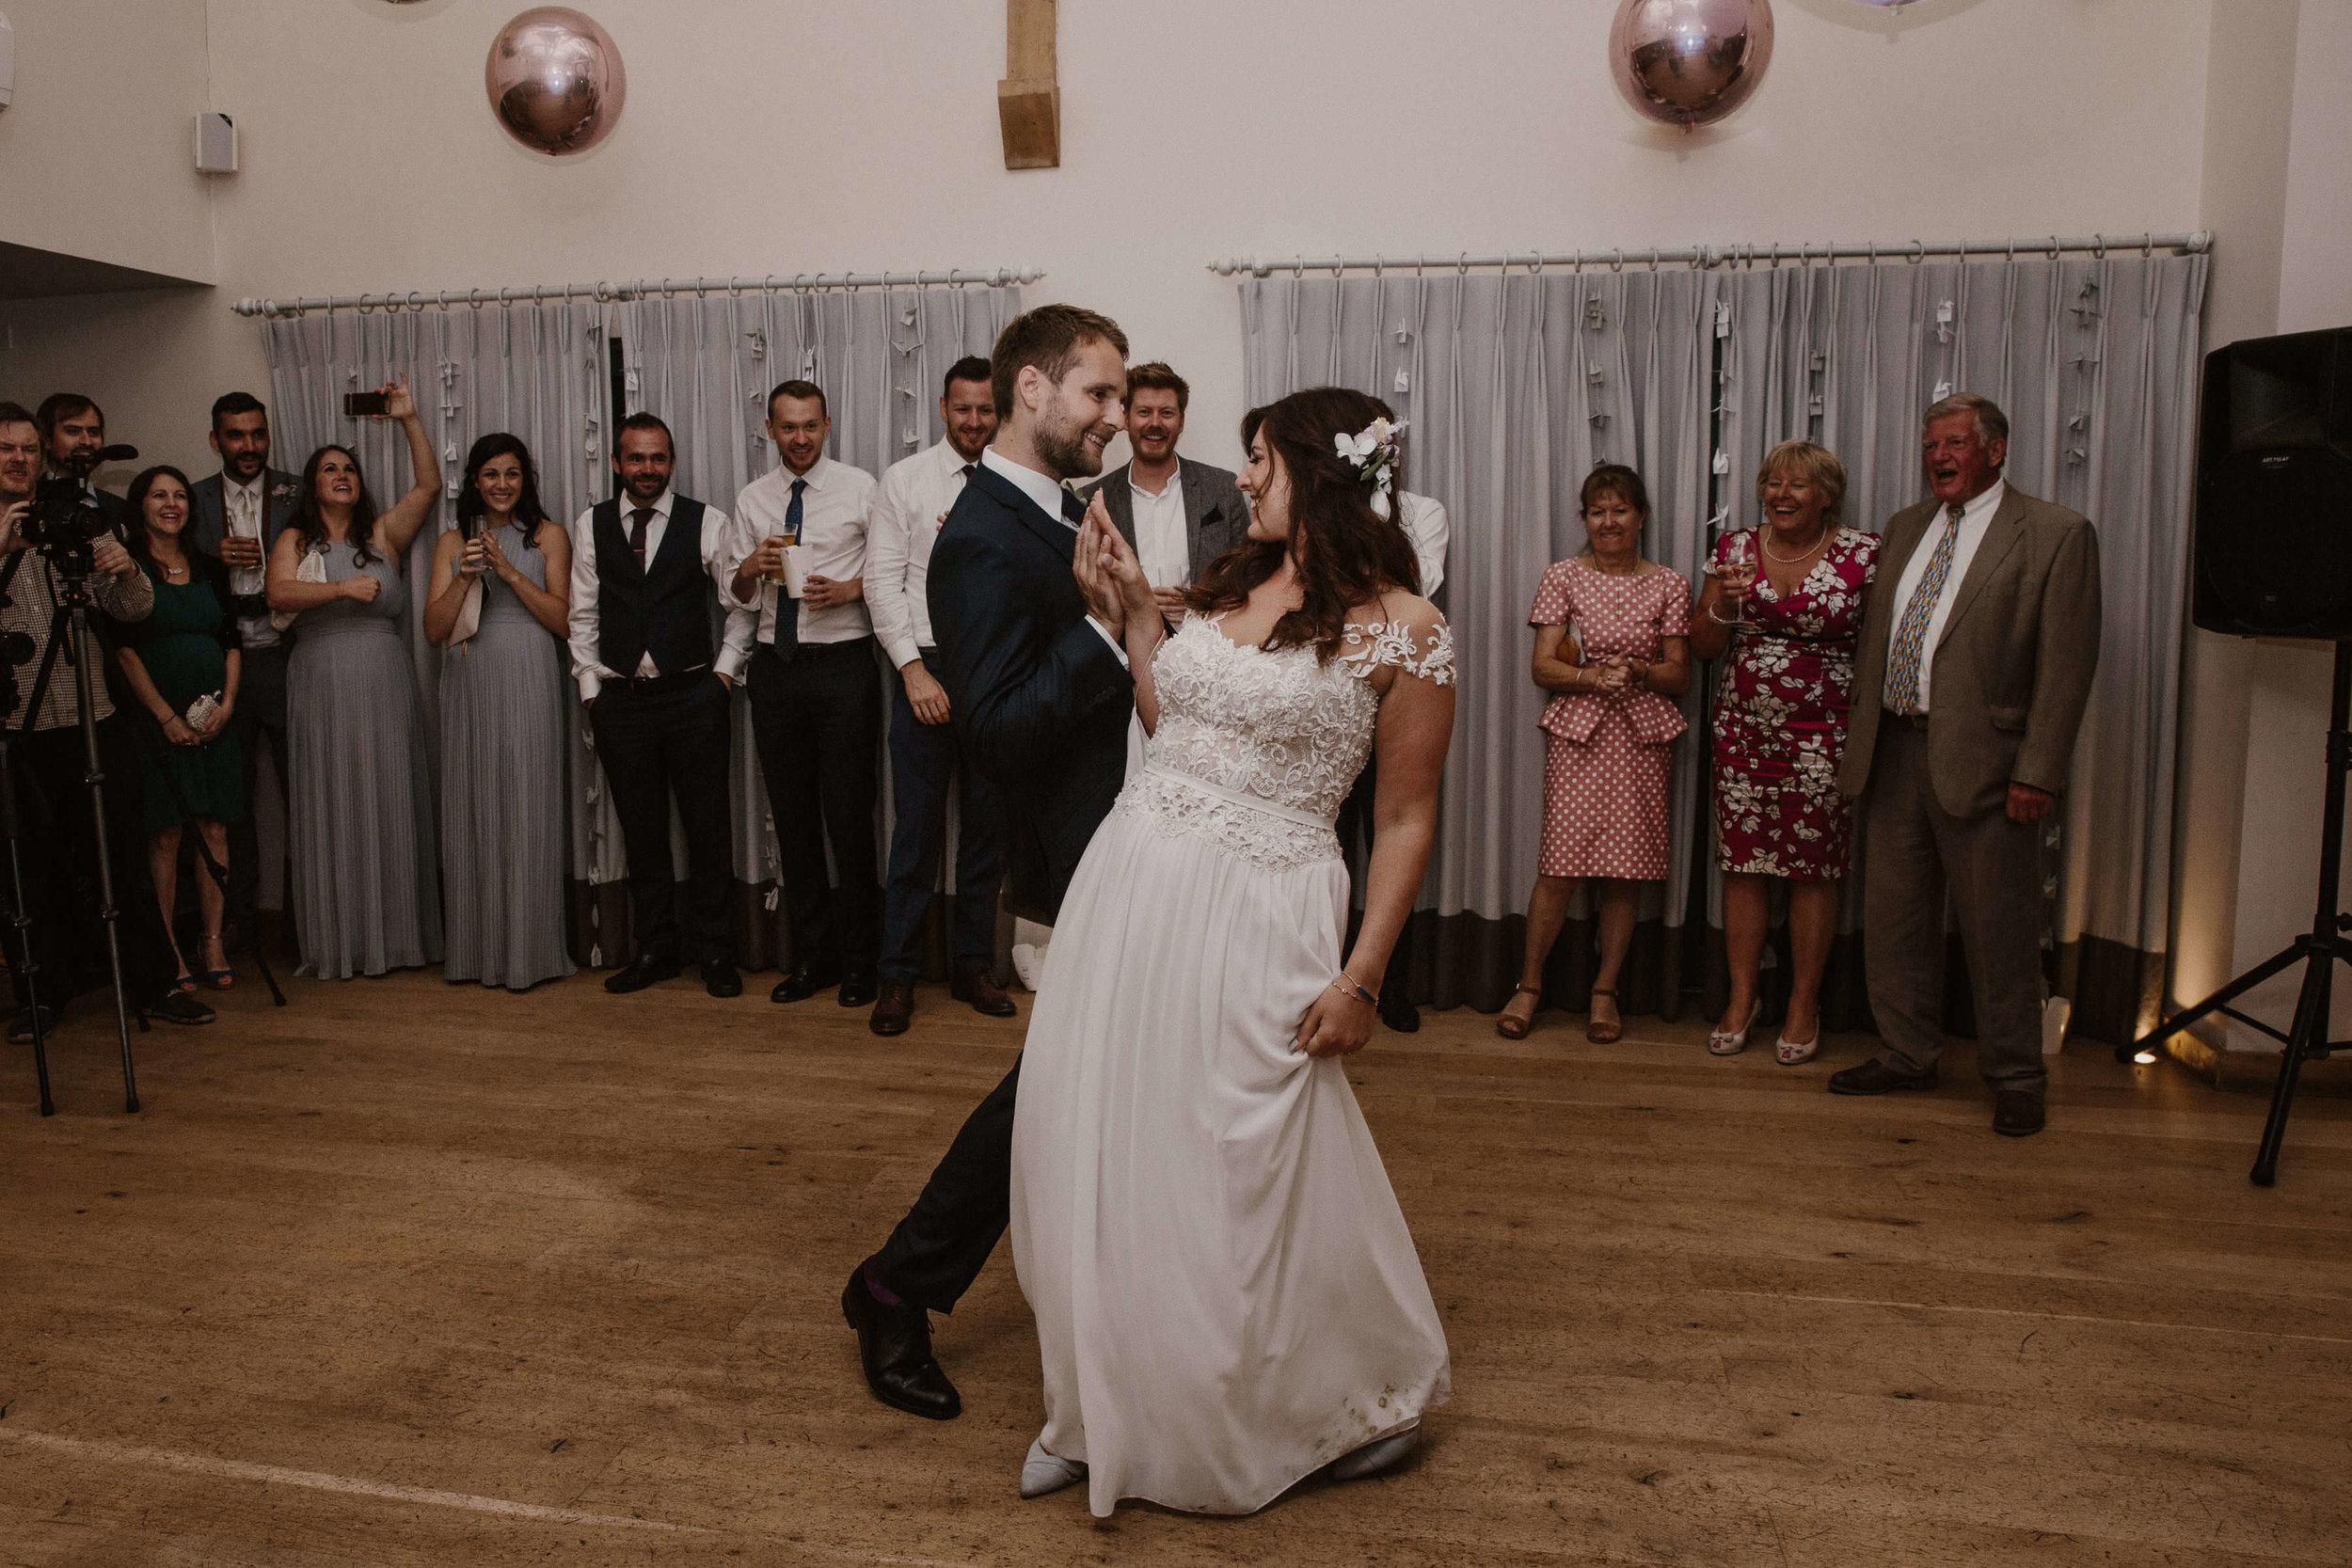 Nat and Tom - 10 - Dancefloor - Sara Lincoln Photography-4.jpg